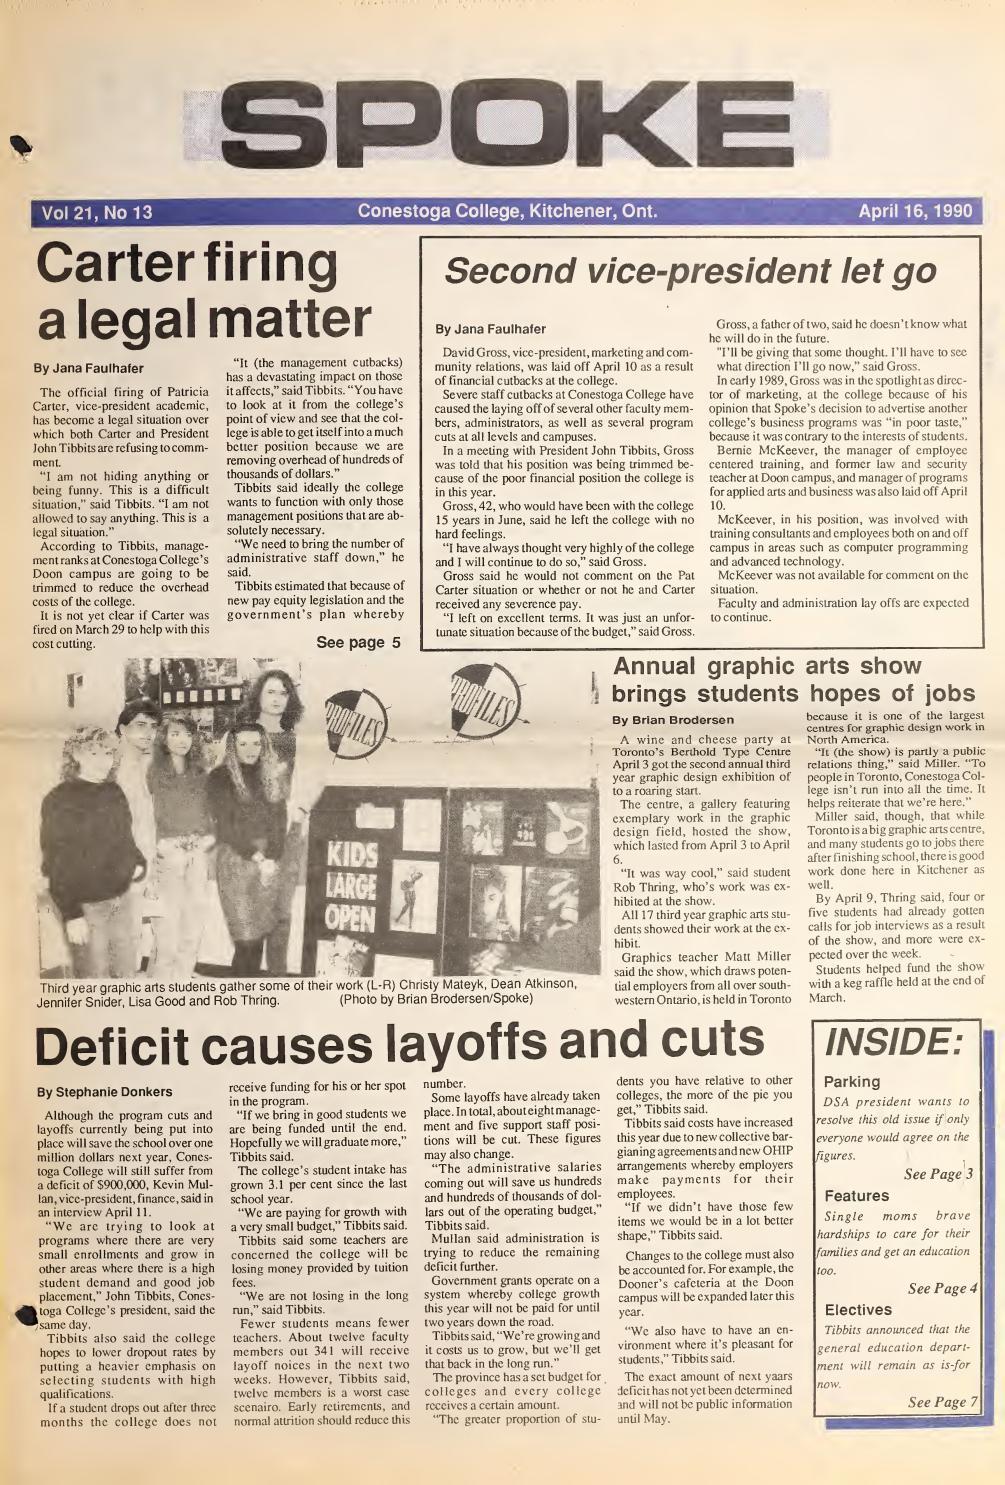 Digital Edition - April 16, 1990 by SPOKENewspaper - issuu